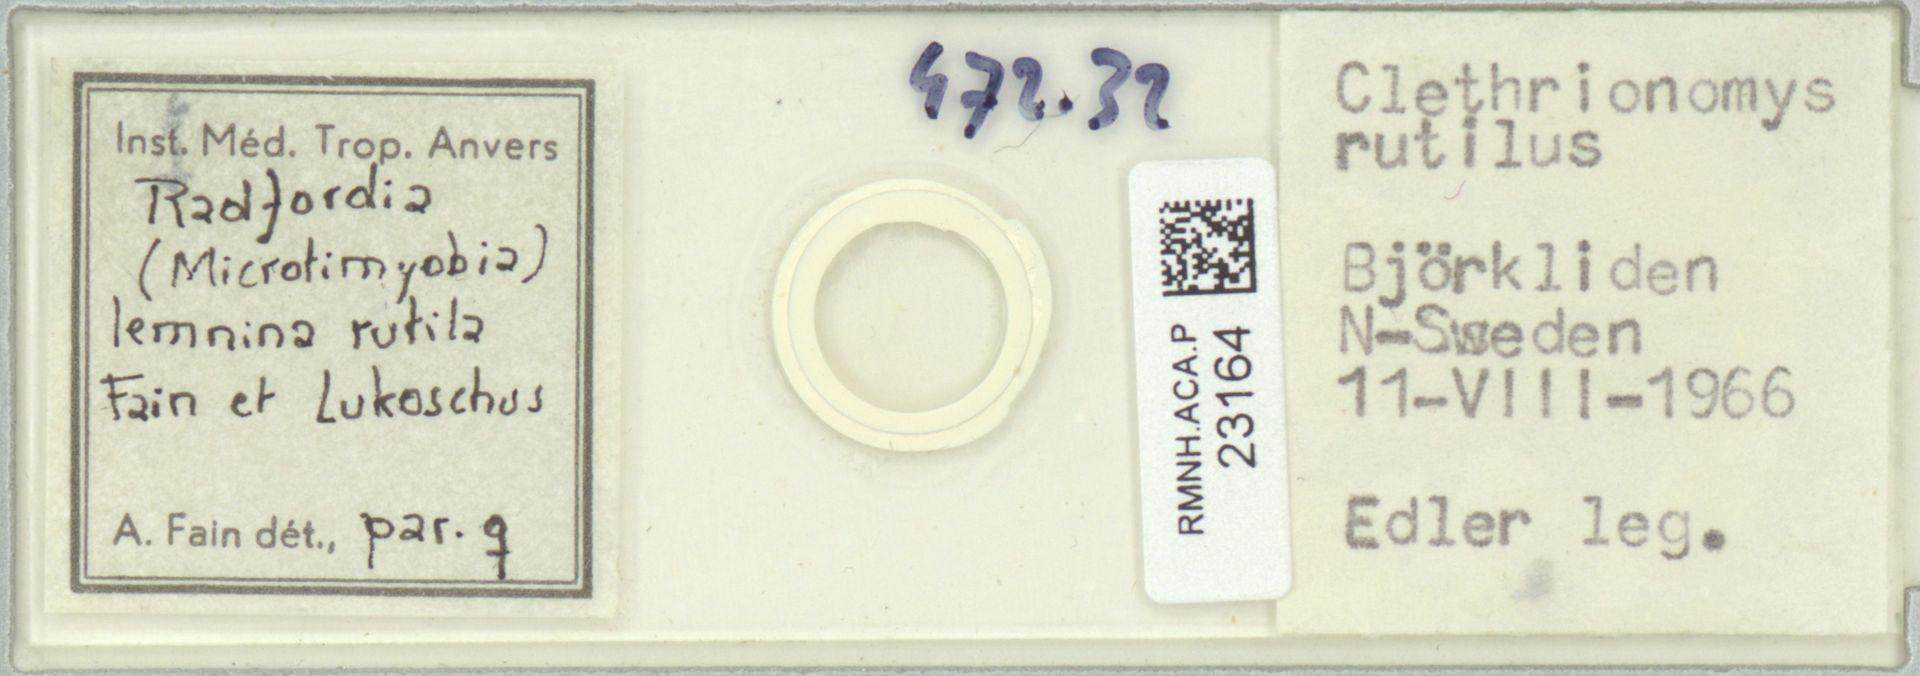 RMNH.ACA.P.23164 | Radfordia (Microtimyobia) lemnina rutila Fain et Lukoschus